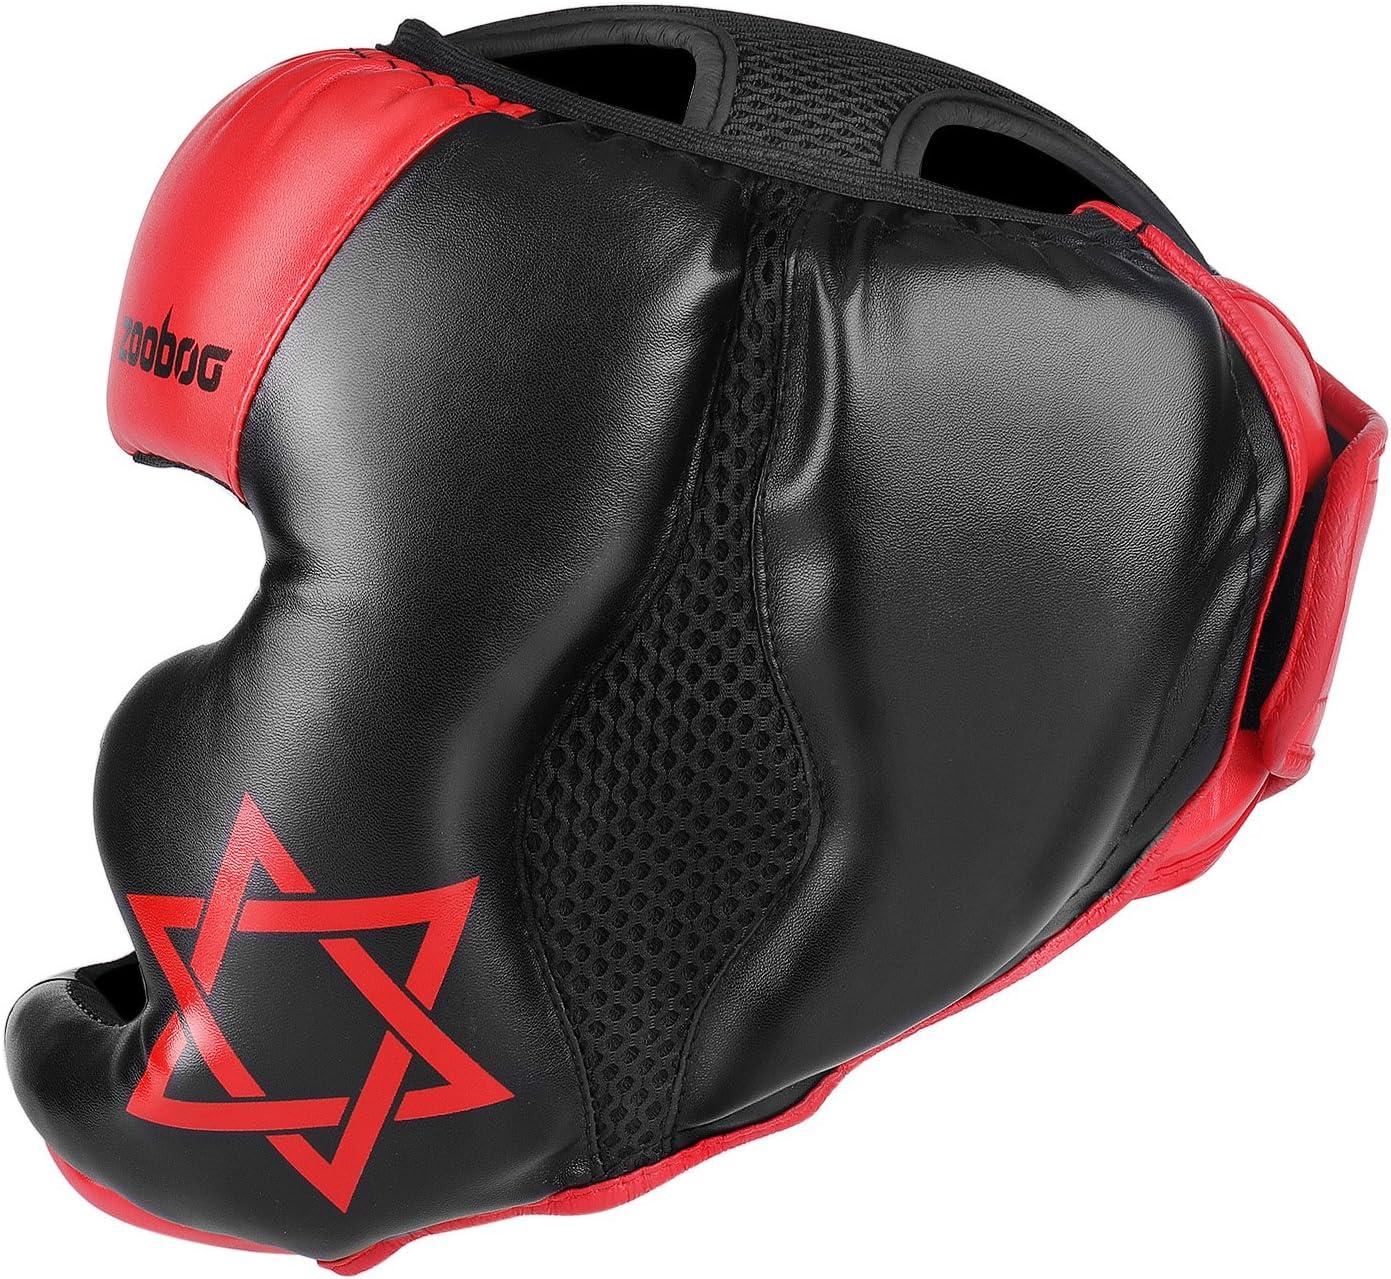 Flexzion MMA Headgear UFC Muay Thai Kickboxing Artes Marciales Sparring Taekwondo Karate Lucha Deportes Boxeo Lucha Maya Oculto Cuero Casco protecci/ón Suministros Equipo